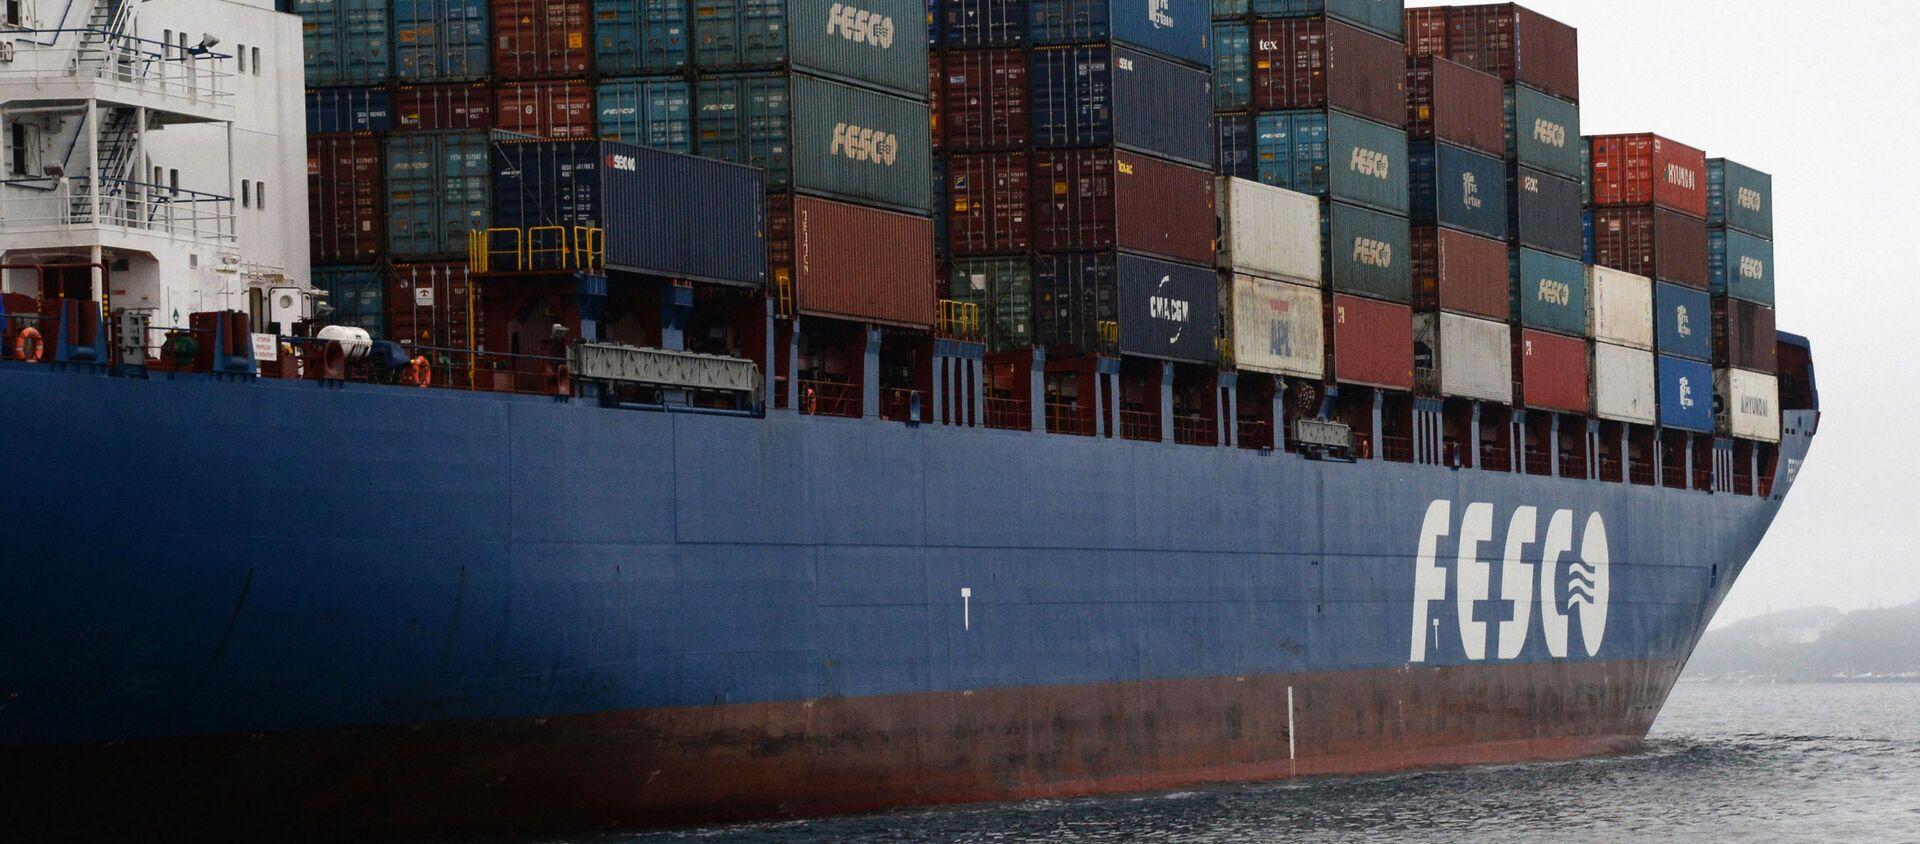 Tàu container Fesco Diomid cập cảng Vladivostok - Sputnik Việt Nam, 1920, 16.12.2019